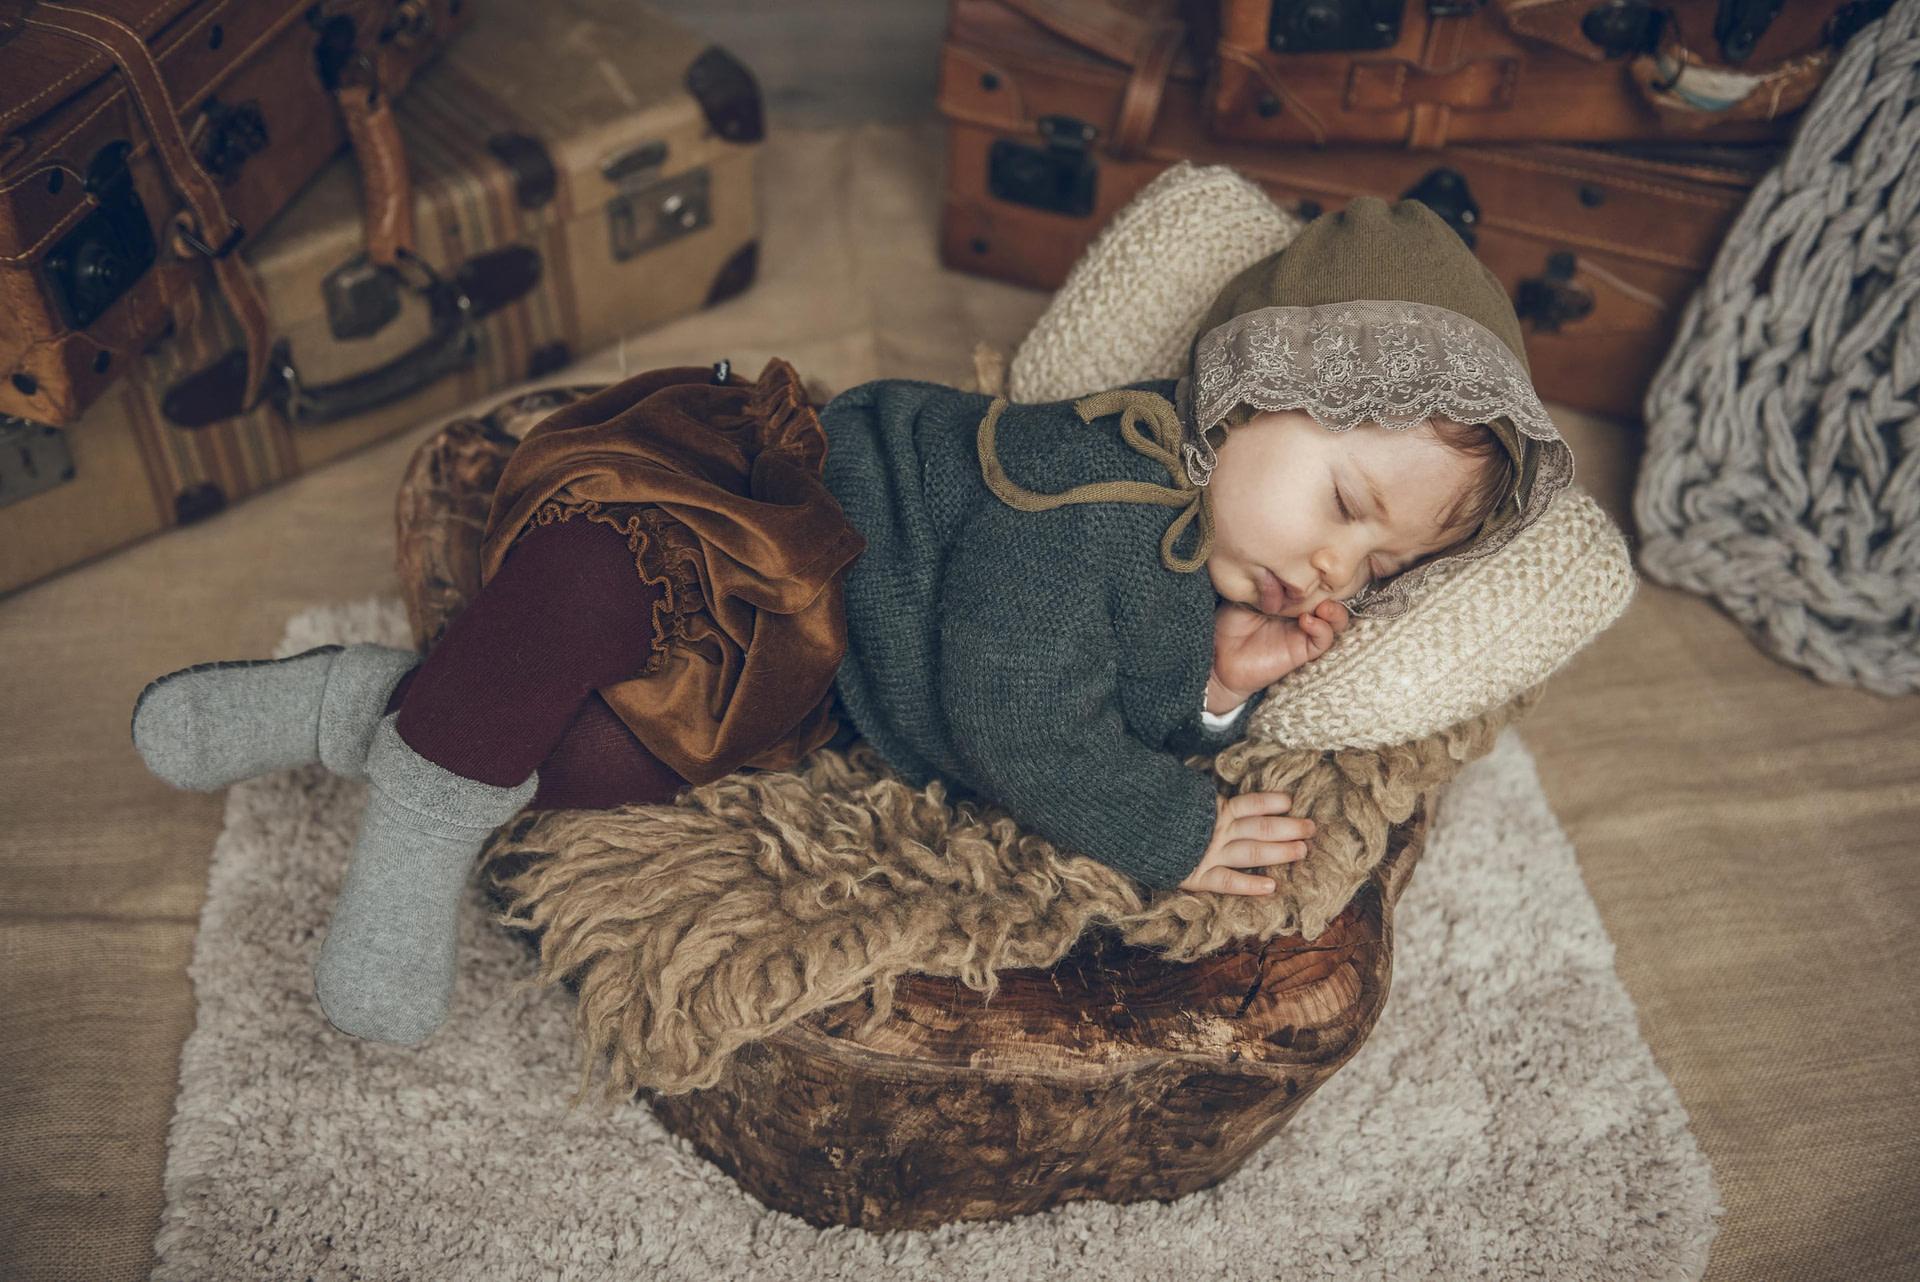 fotografia-fotos-girona-figueres-emporda-monica-quintana-niños-niñas-familia-retrato-verano-ideas-fotos familiares 3